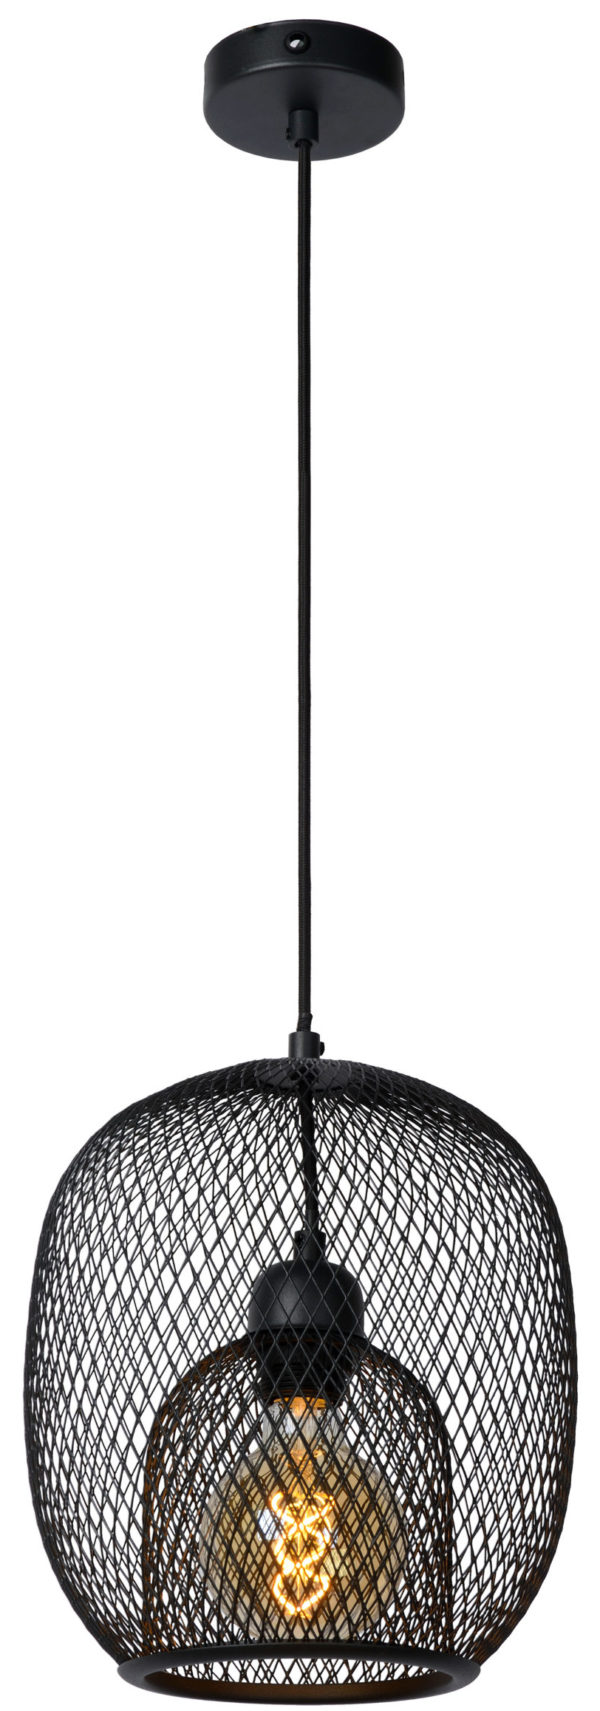 Jerrel hanglamp - zwart Lucide Hanglamp 78396/01/30